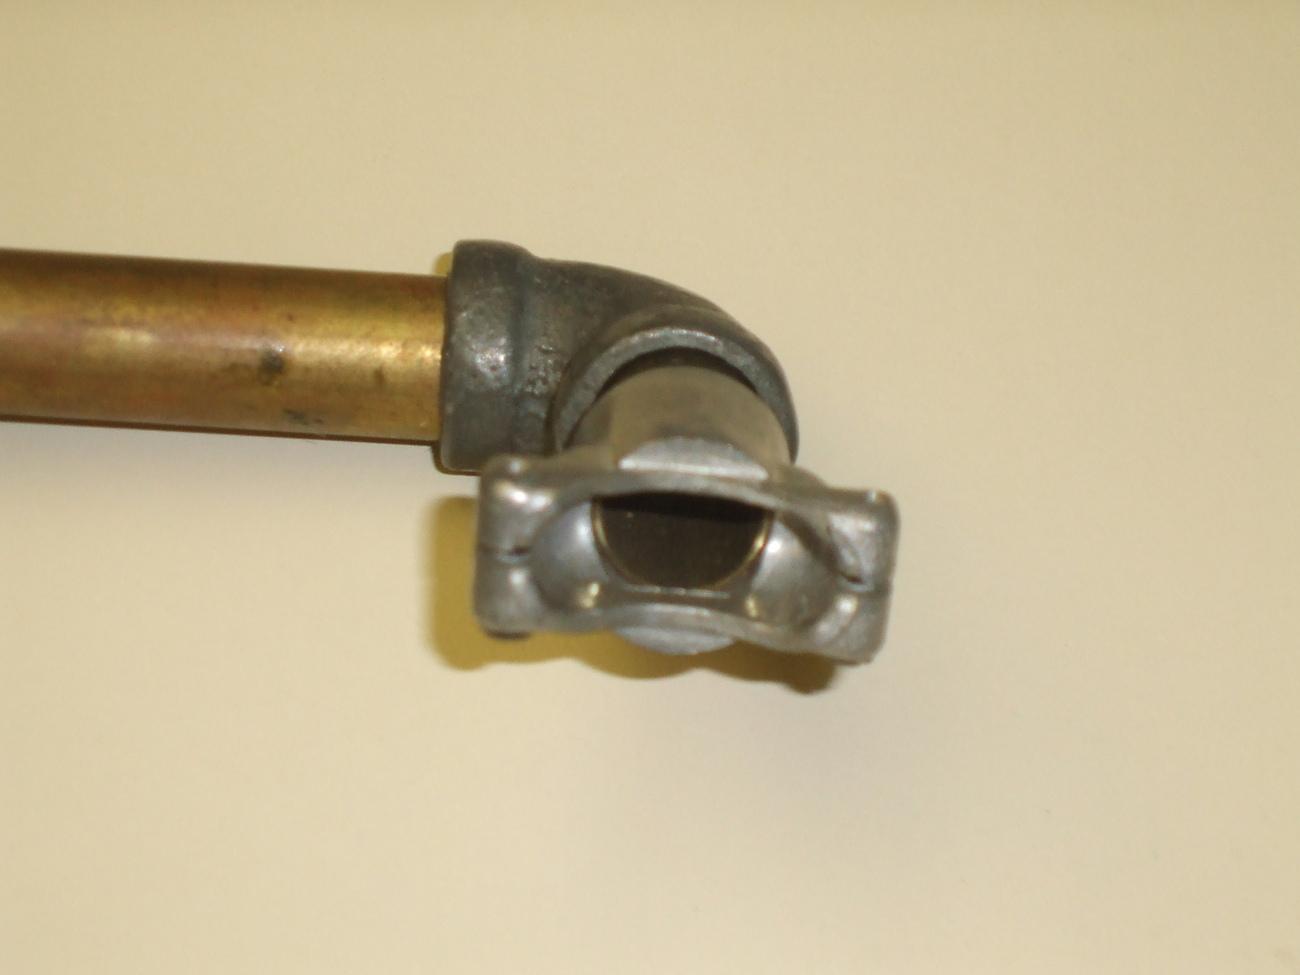 Model Boat Muffler For Cameron marine Gas engine